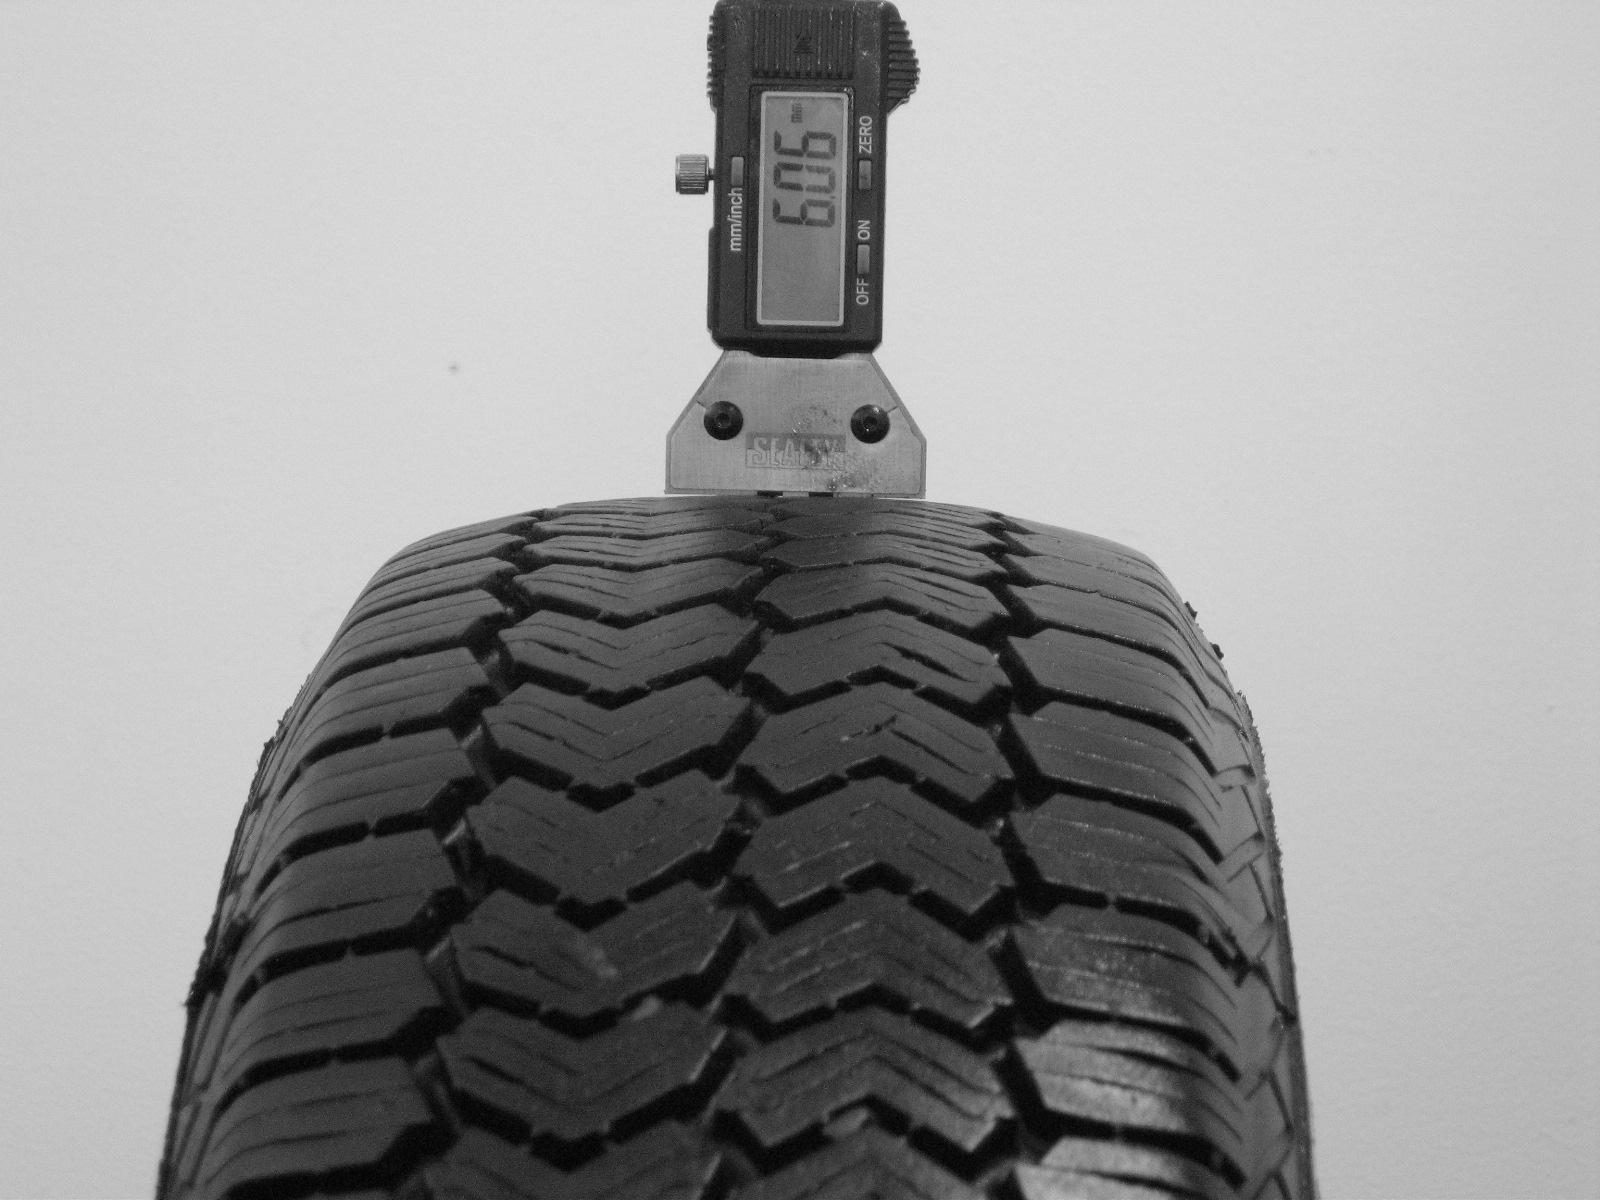 Použité-Pneu-Bazar - 165/80 R13 FULDA KRISTALL 3 -kusovka-rezerva 3mm